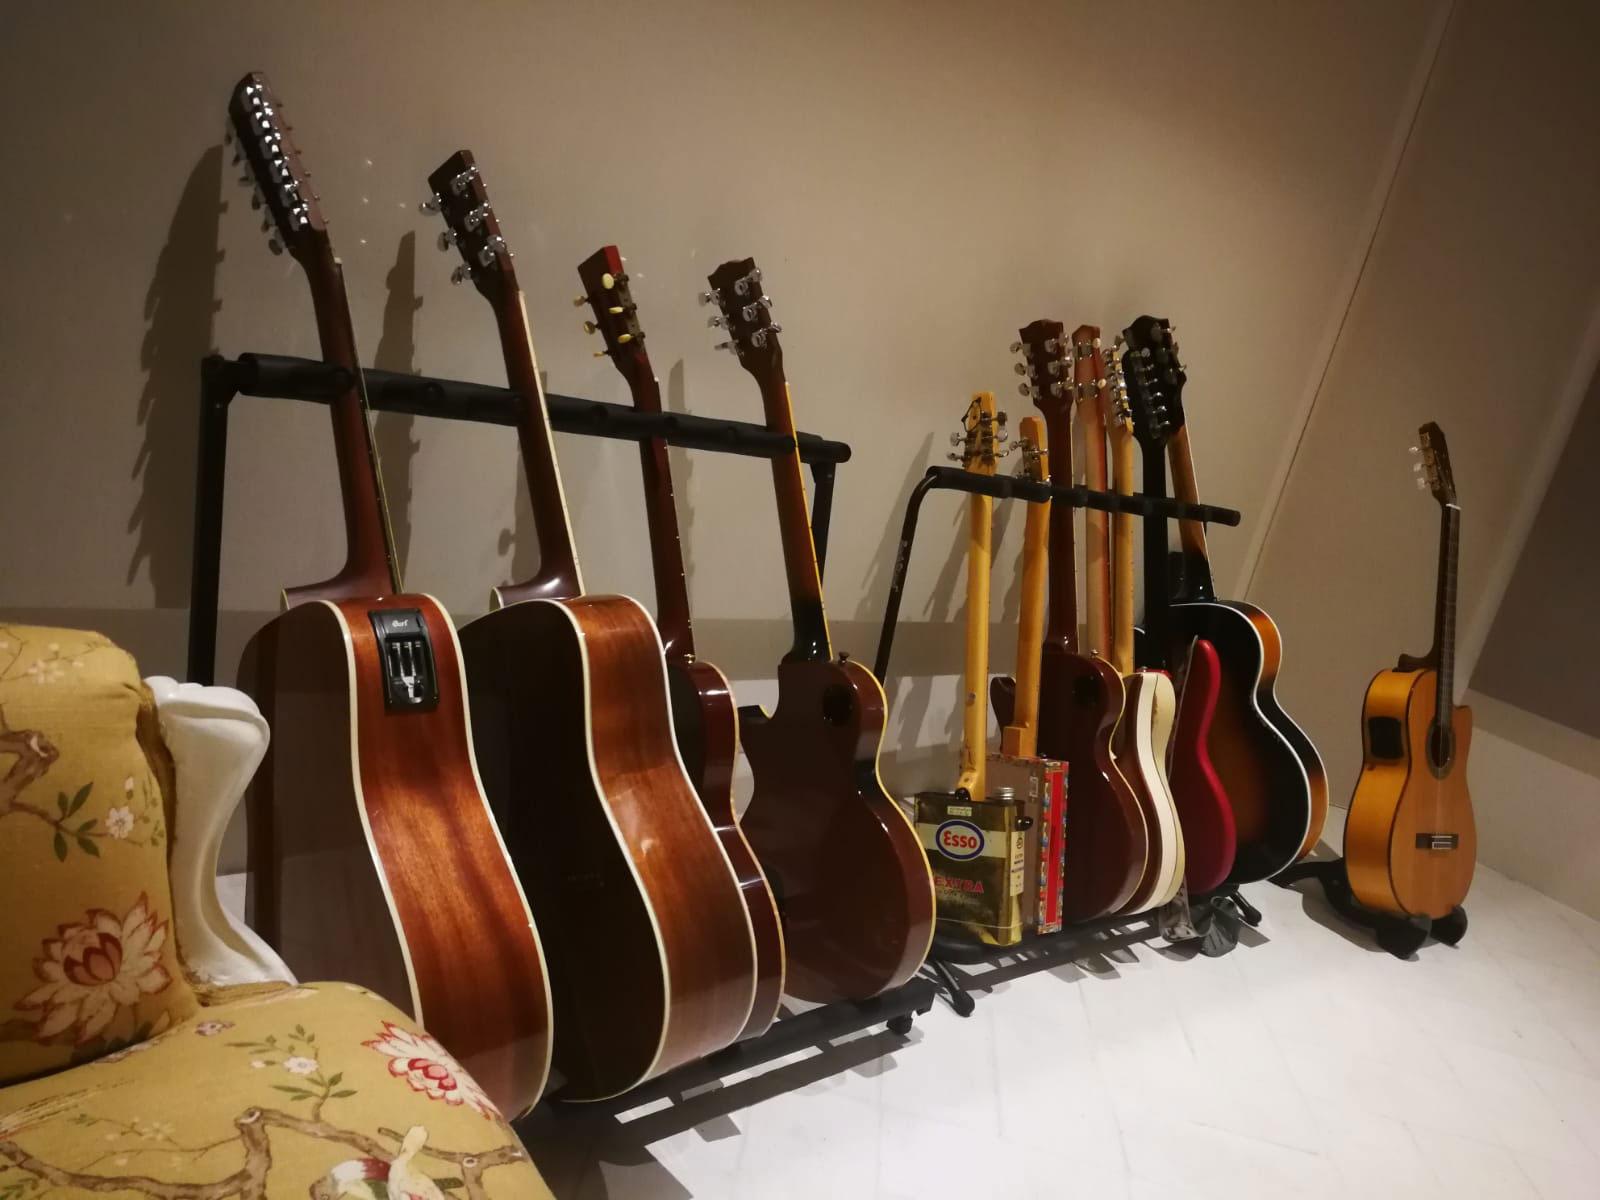 isobooth-asaf-avidan-instruments